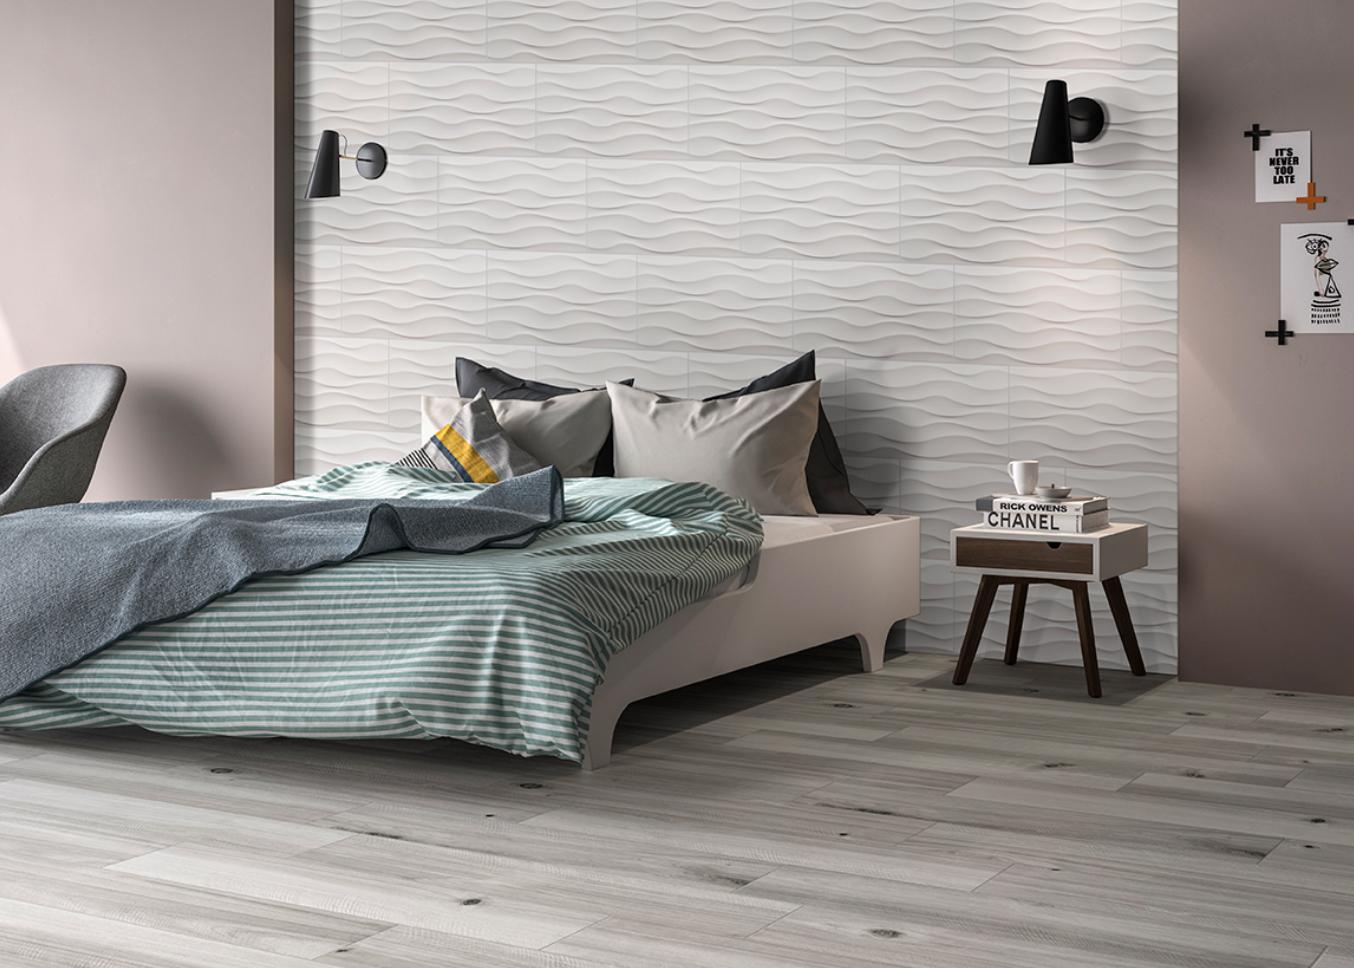 spectacular 3D wall tile designs